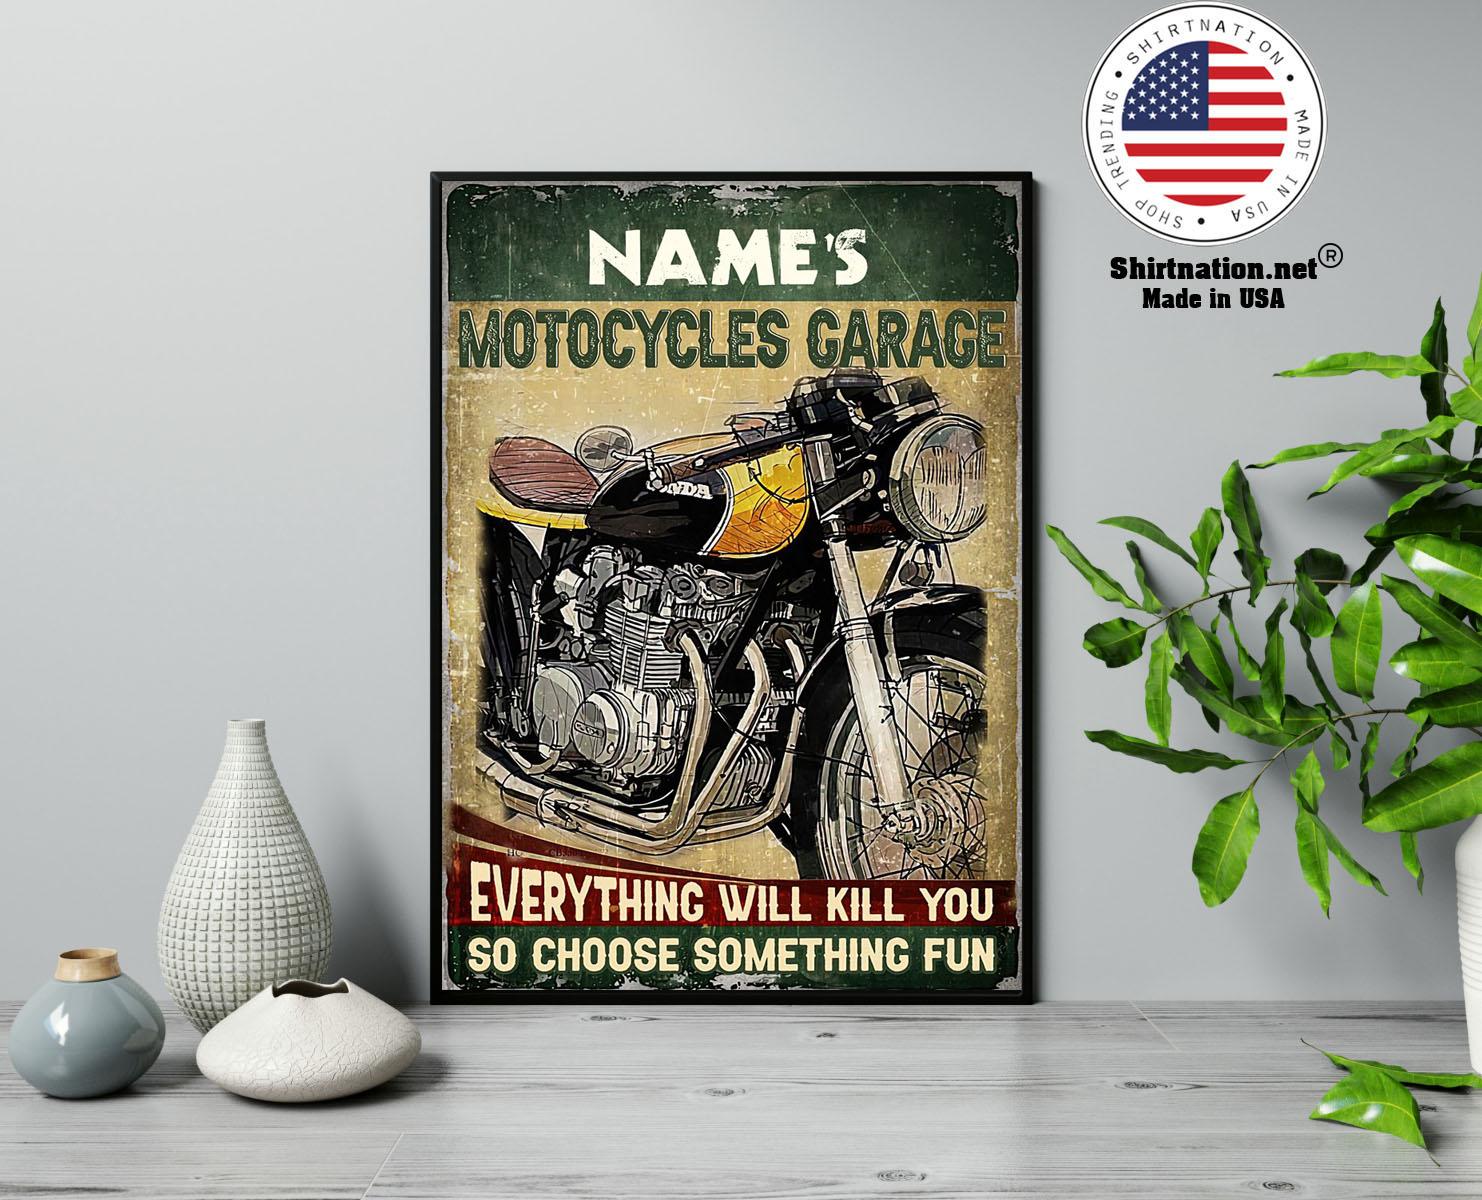 Motocycles garage eveyrthing will kill you so choose something fun custom name poster 13